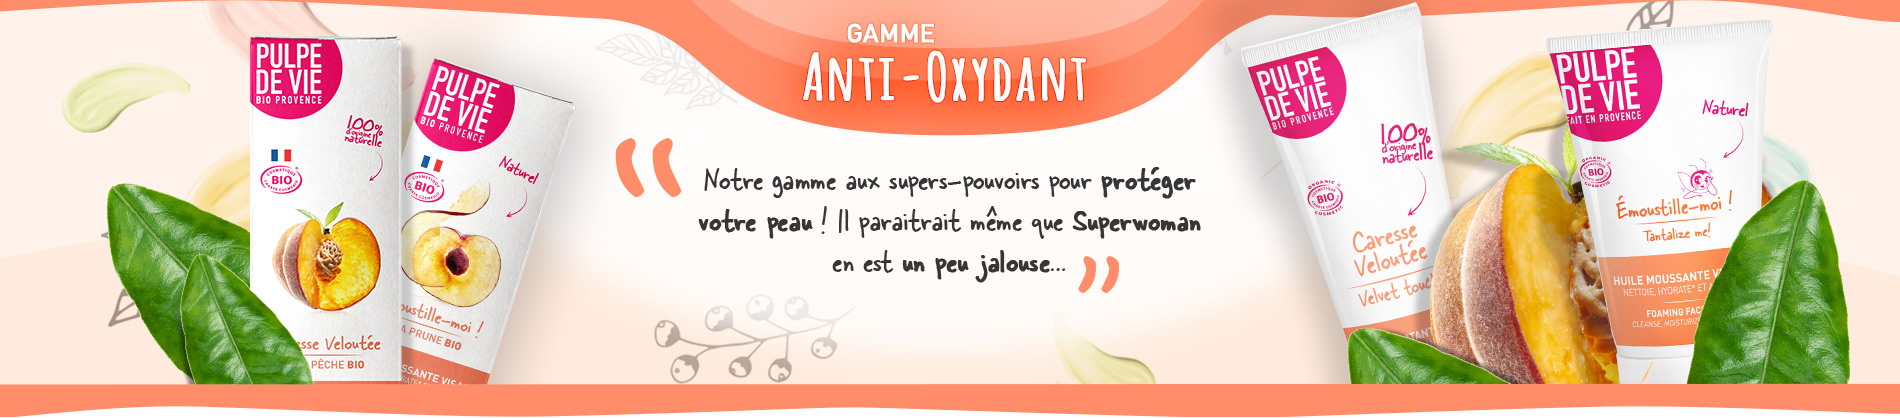 Gamme Anti-Oxydants